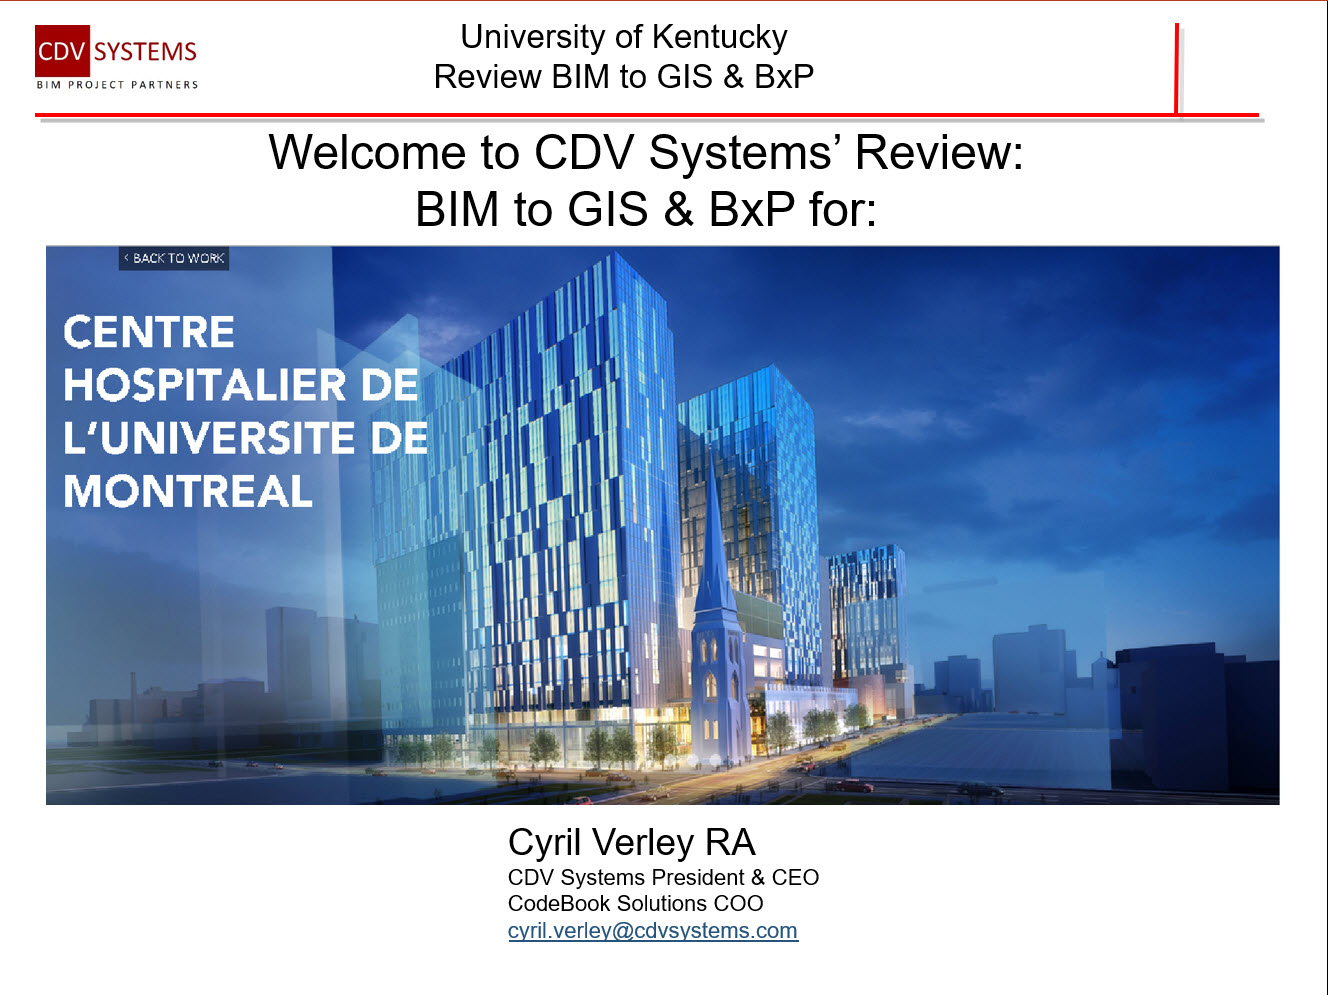 University of Kentucky_001.jpg